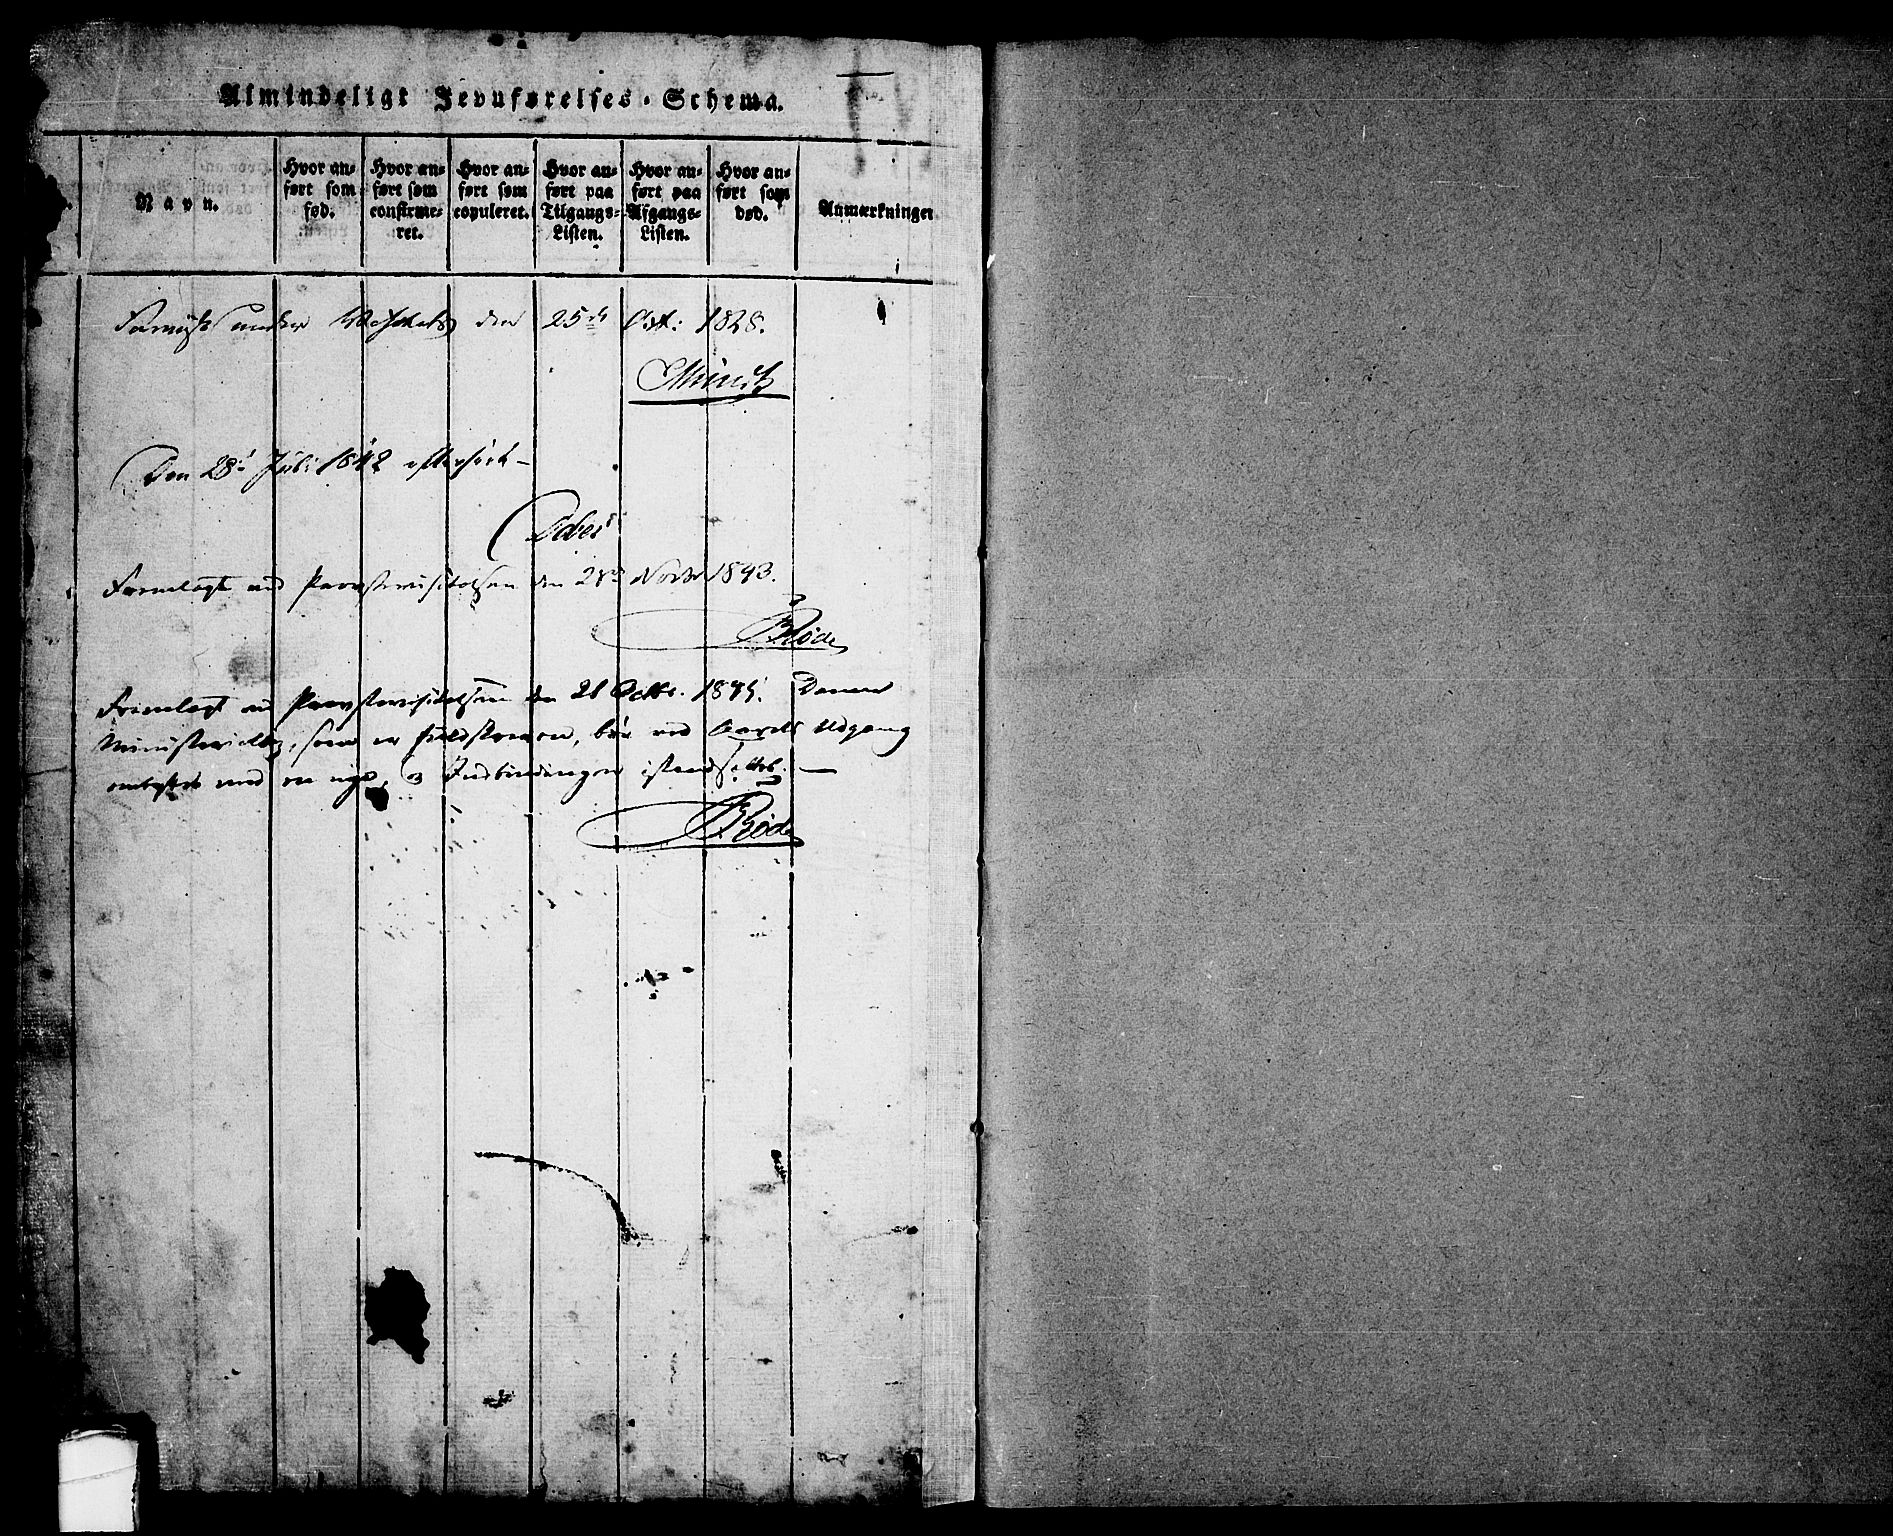 SAKO, Brevik kirkebøker, G/Ga/L0001: Klokkerbok nr. 1, 1814-1845, s. 356